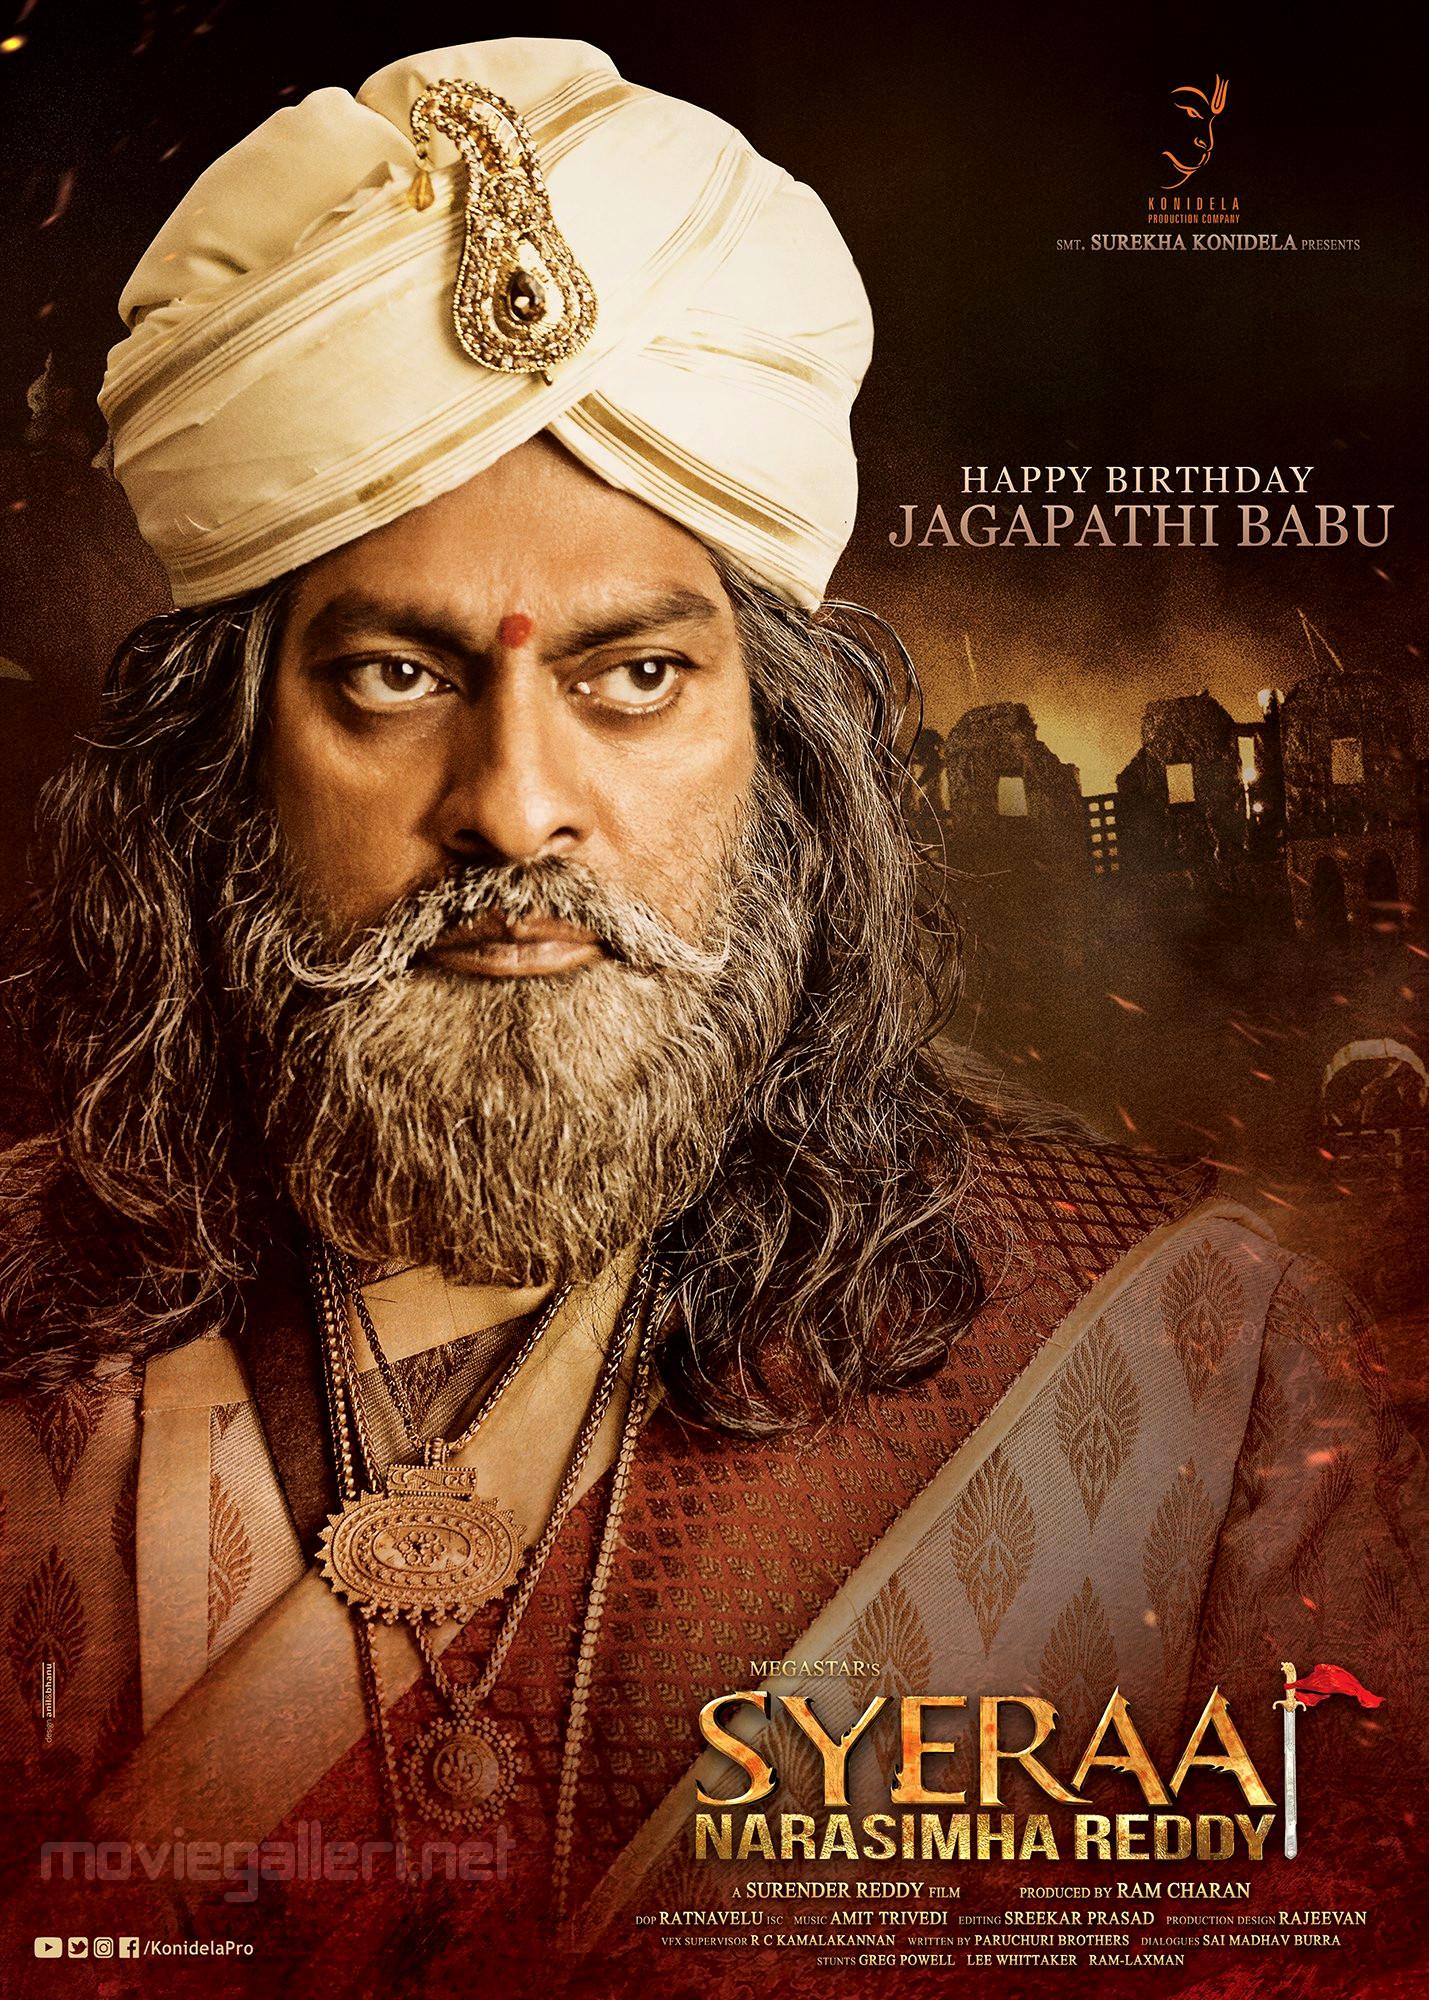 Sye Raa Narasimha Reddy Jagapathi Babu as Veera Reddy HD Poster